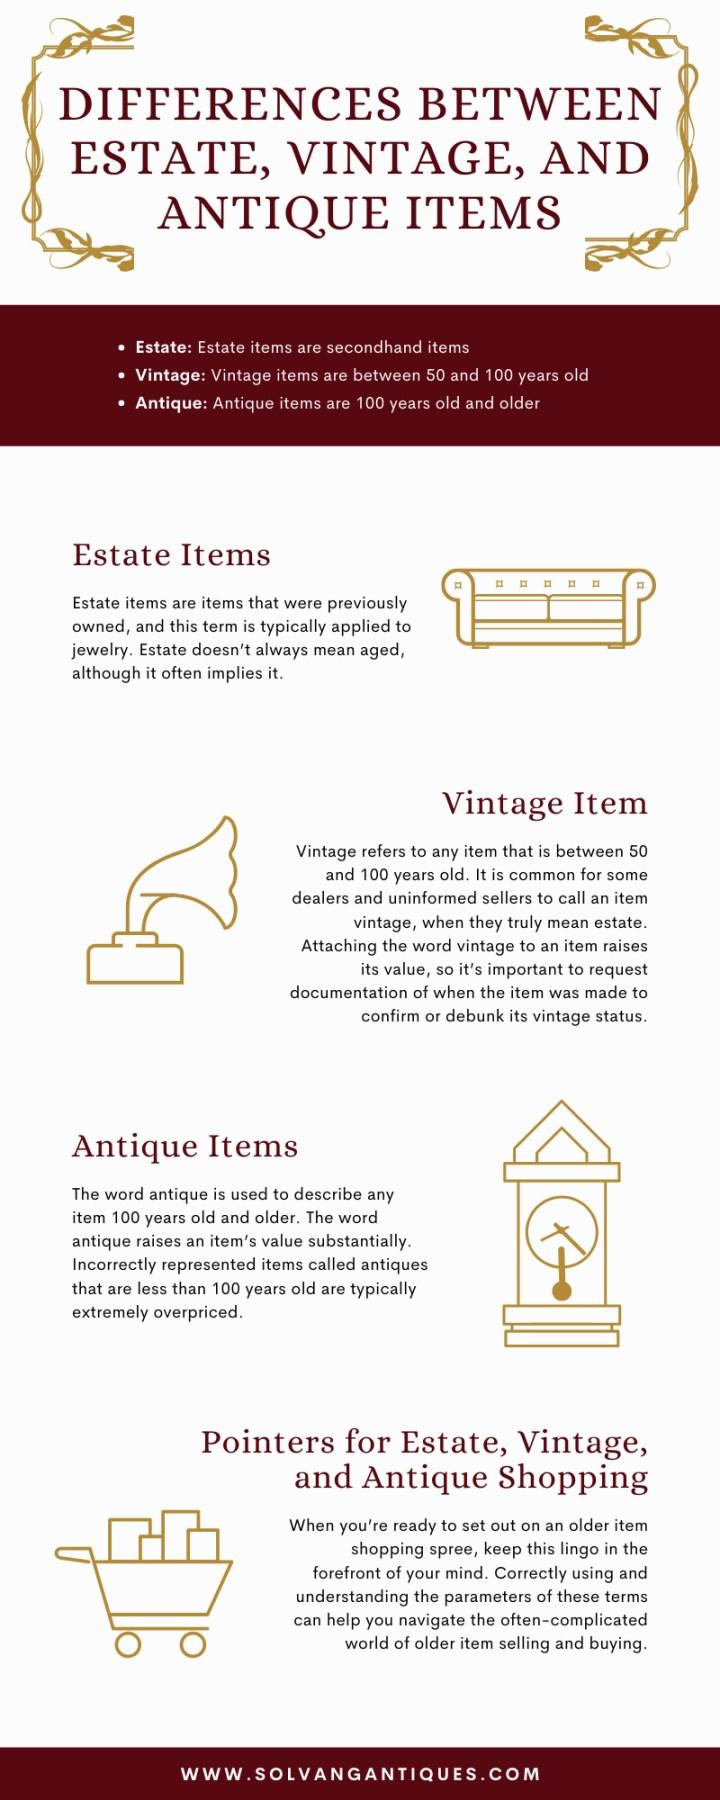 Estate Vintage Antiques Infographic